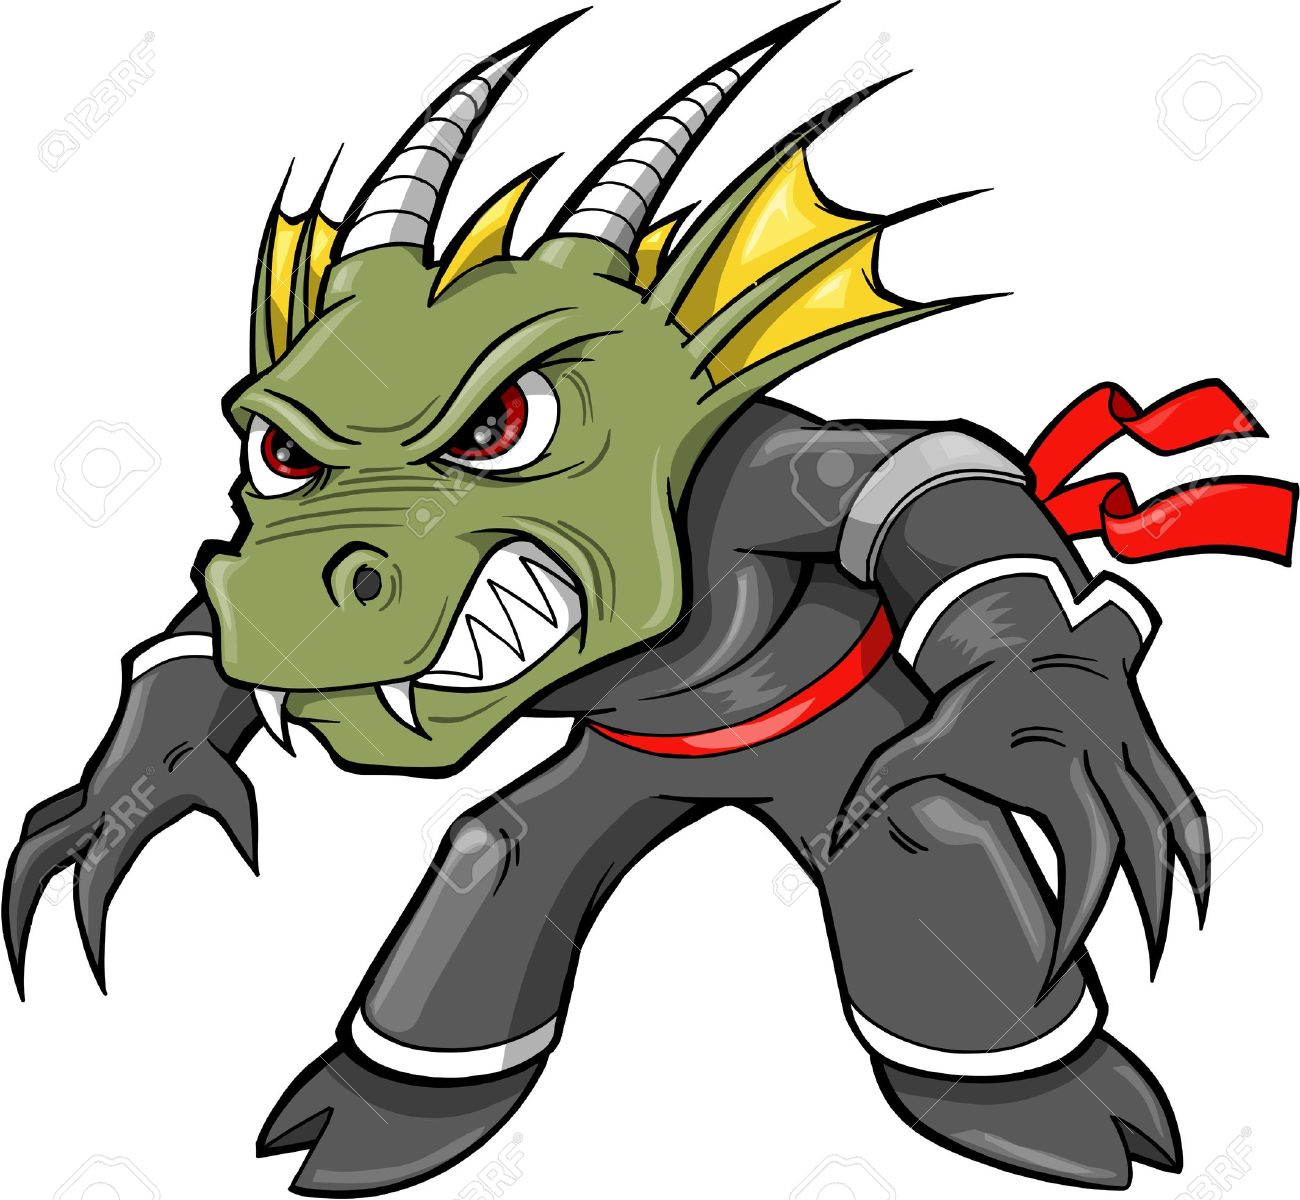 Warrior Ninja Dragon Lizard Vector Illustration - 13067013